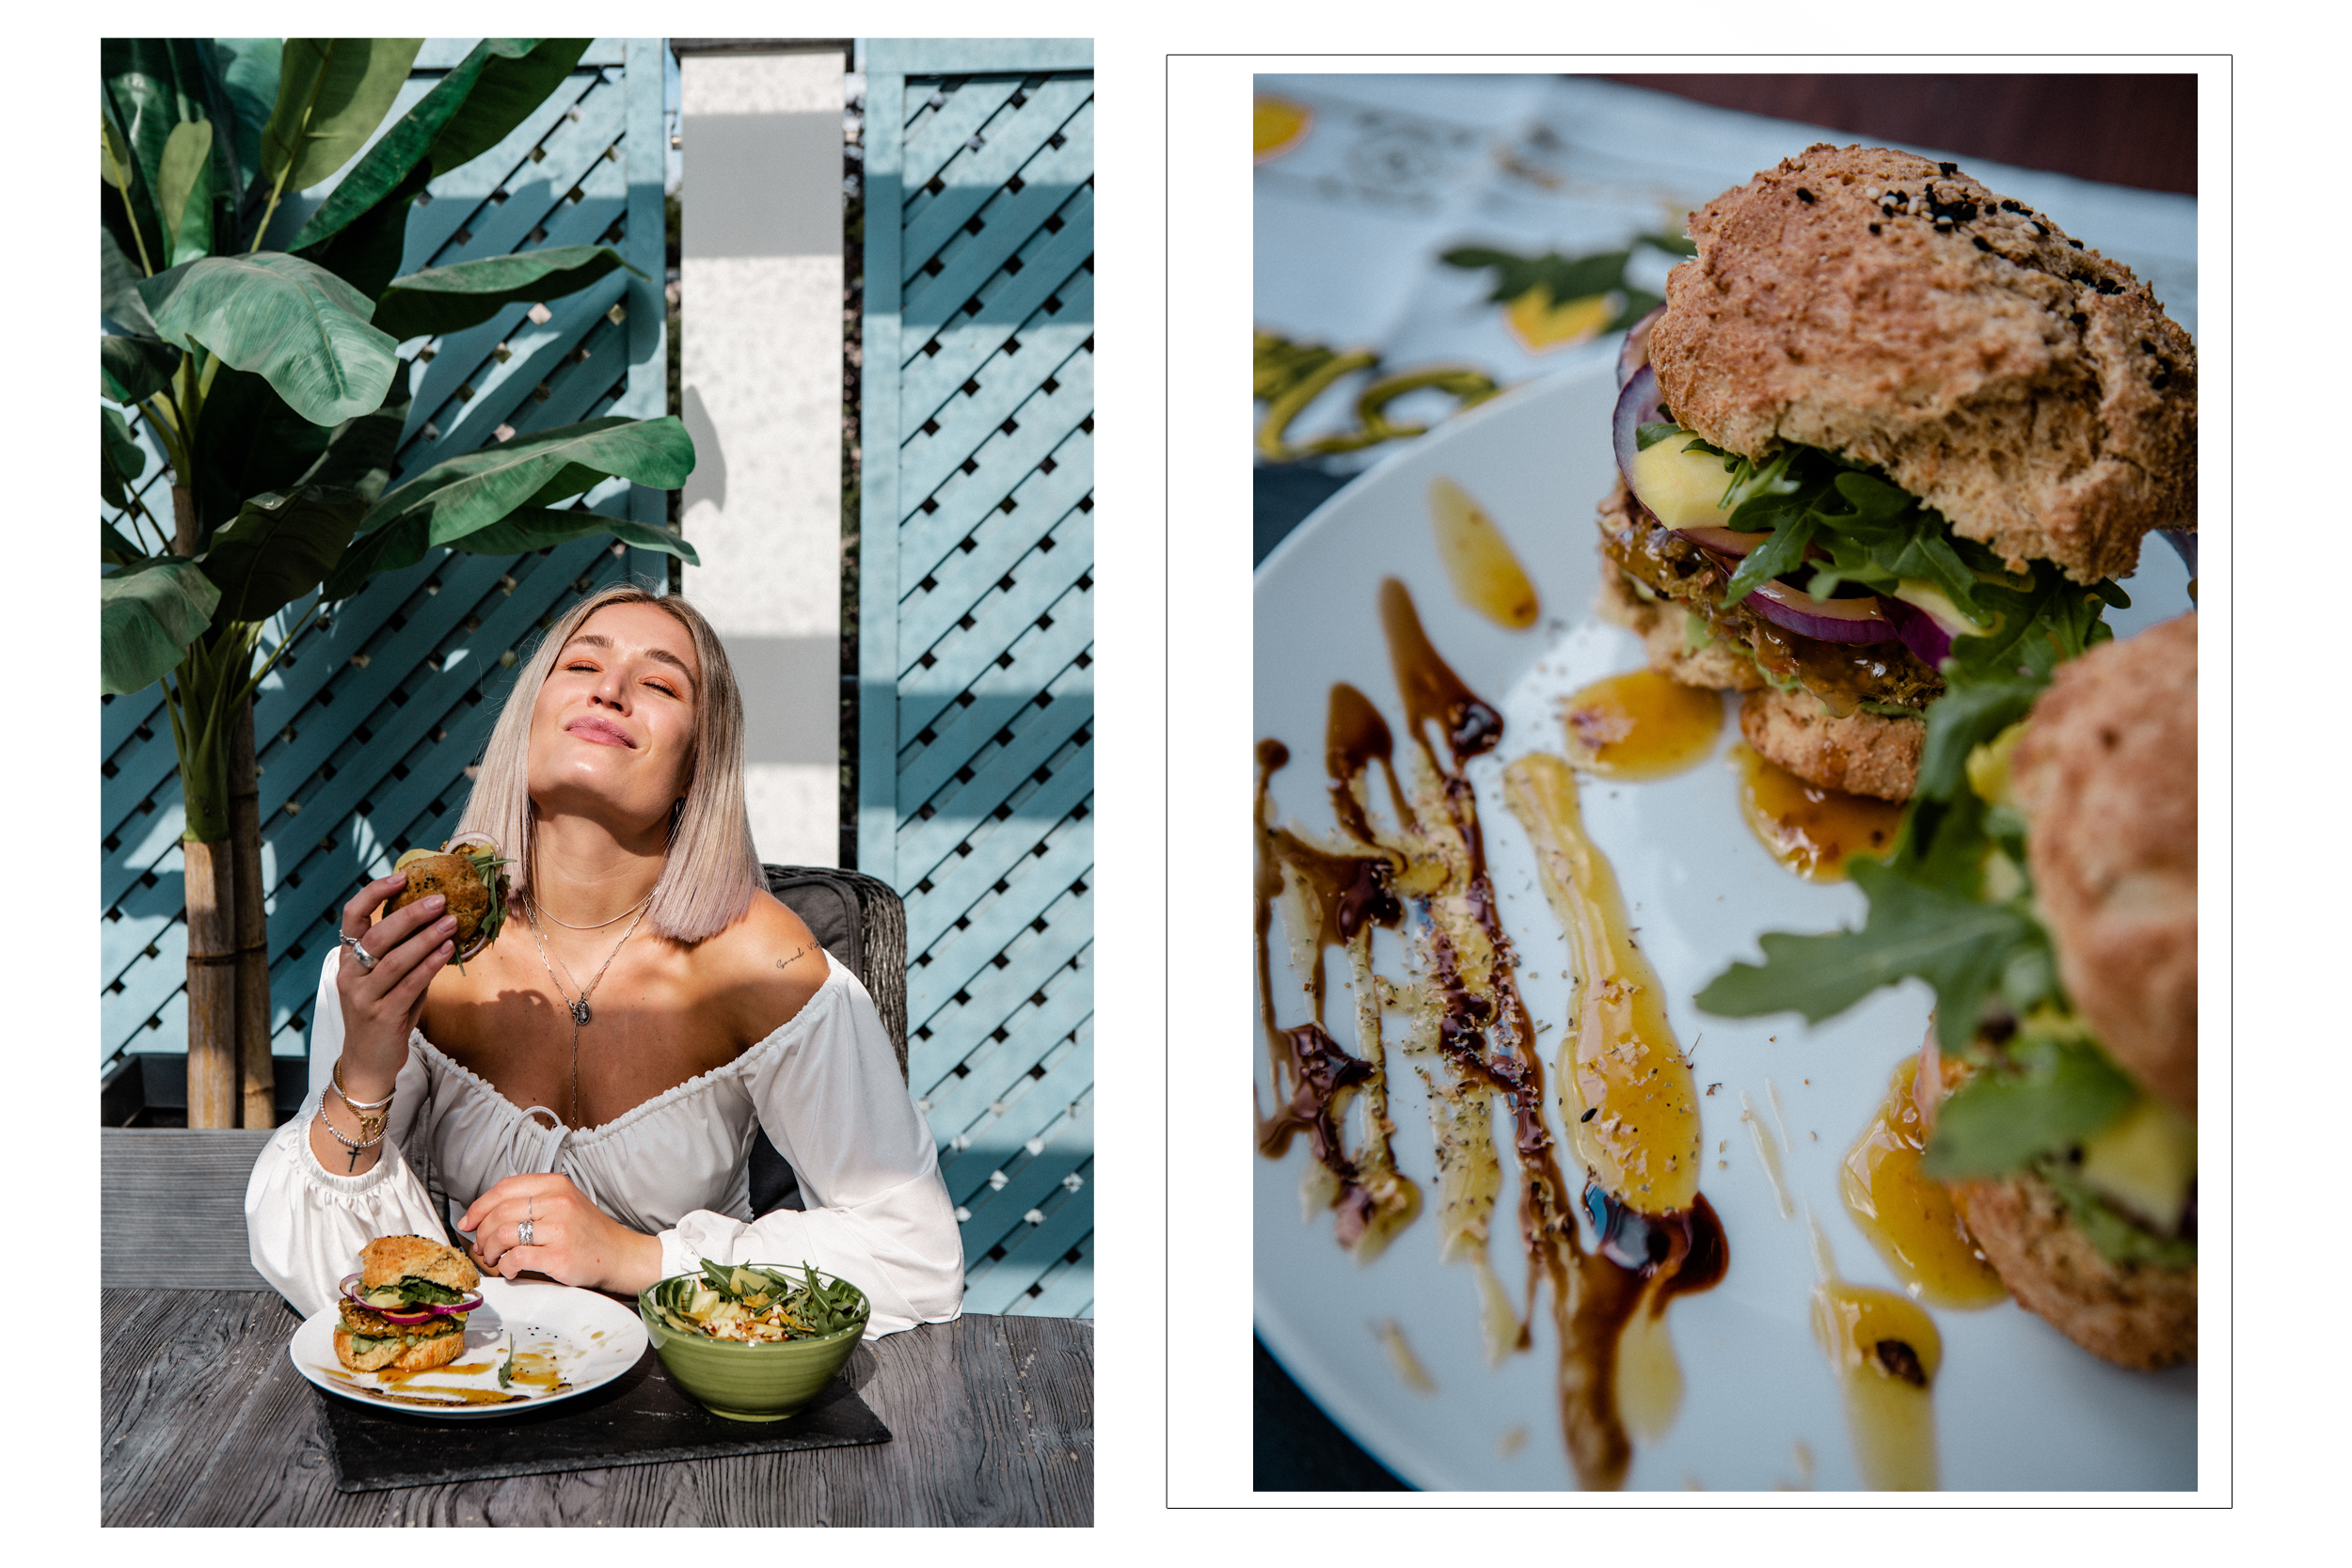 Lauralamode What I Eat In A Day Food Diary Naturata Vegan Recipes Rezepte Gesunde Rezepte Summer Recipes Vegane Rezepte Berlin Foodblogger17